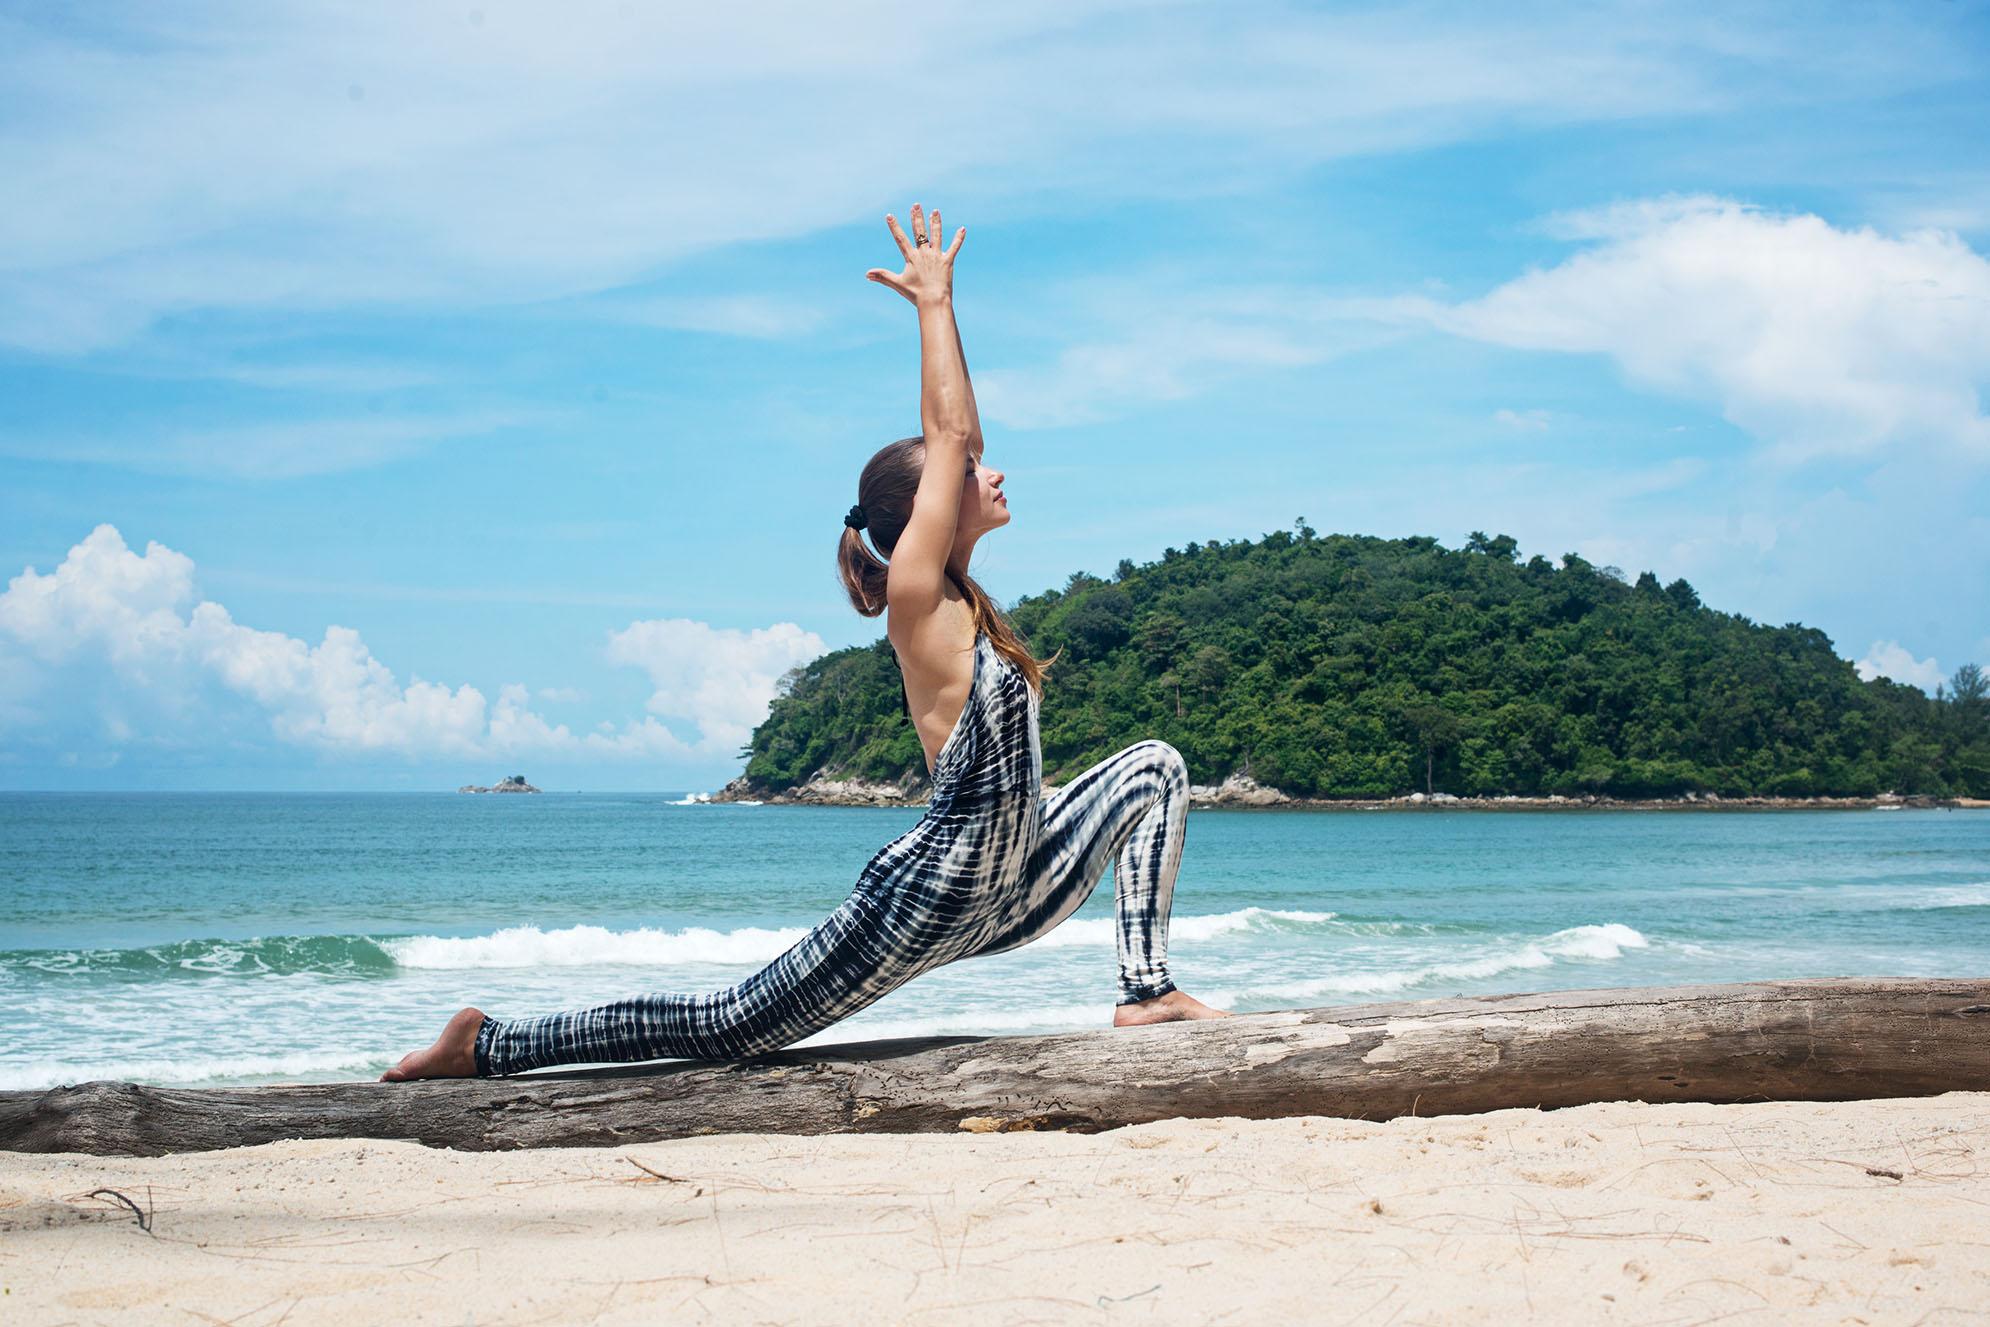 Low Lung Omlala Yoga Tie Dye Jumpsuit Legging Phuket